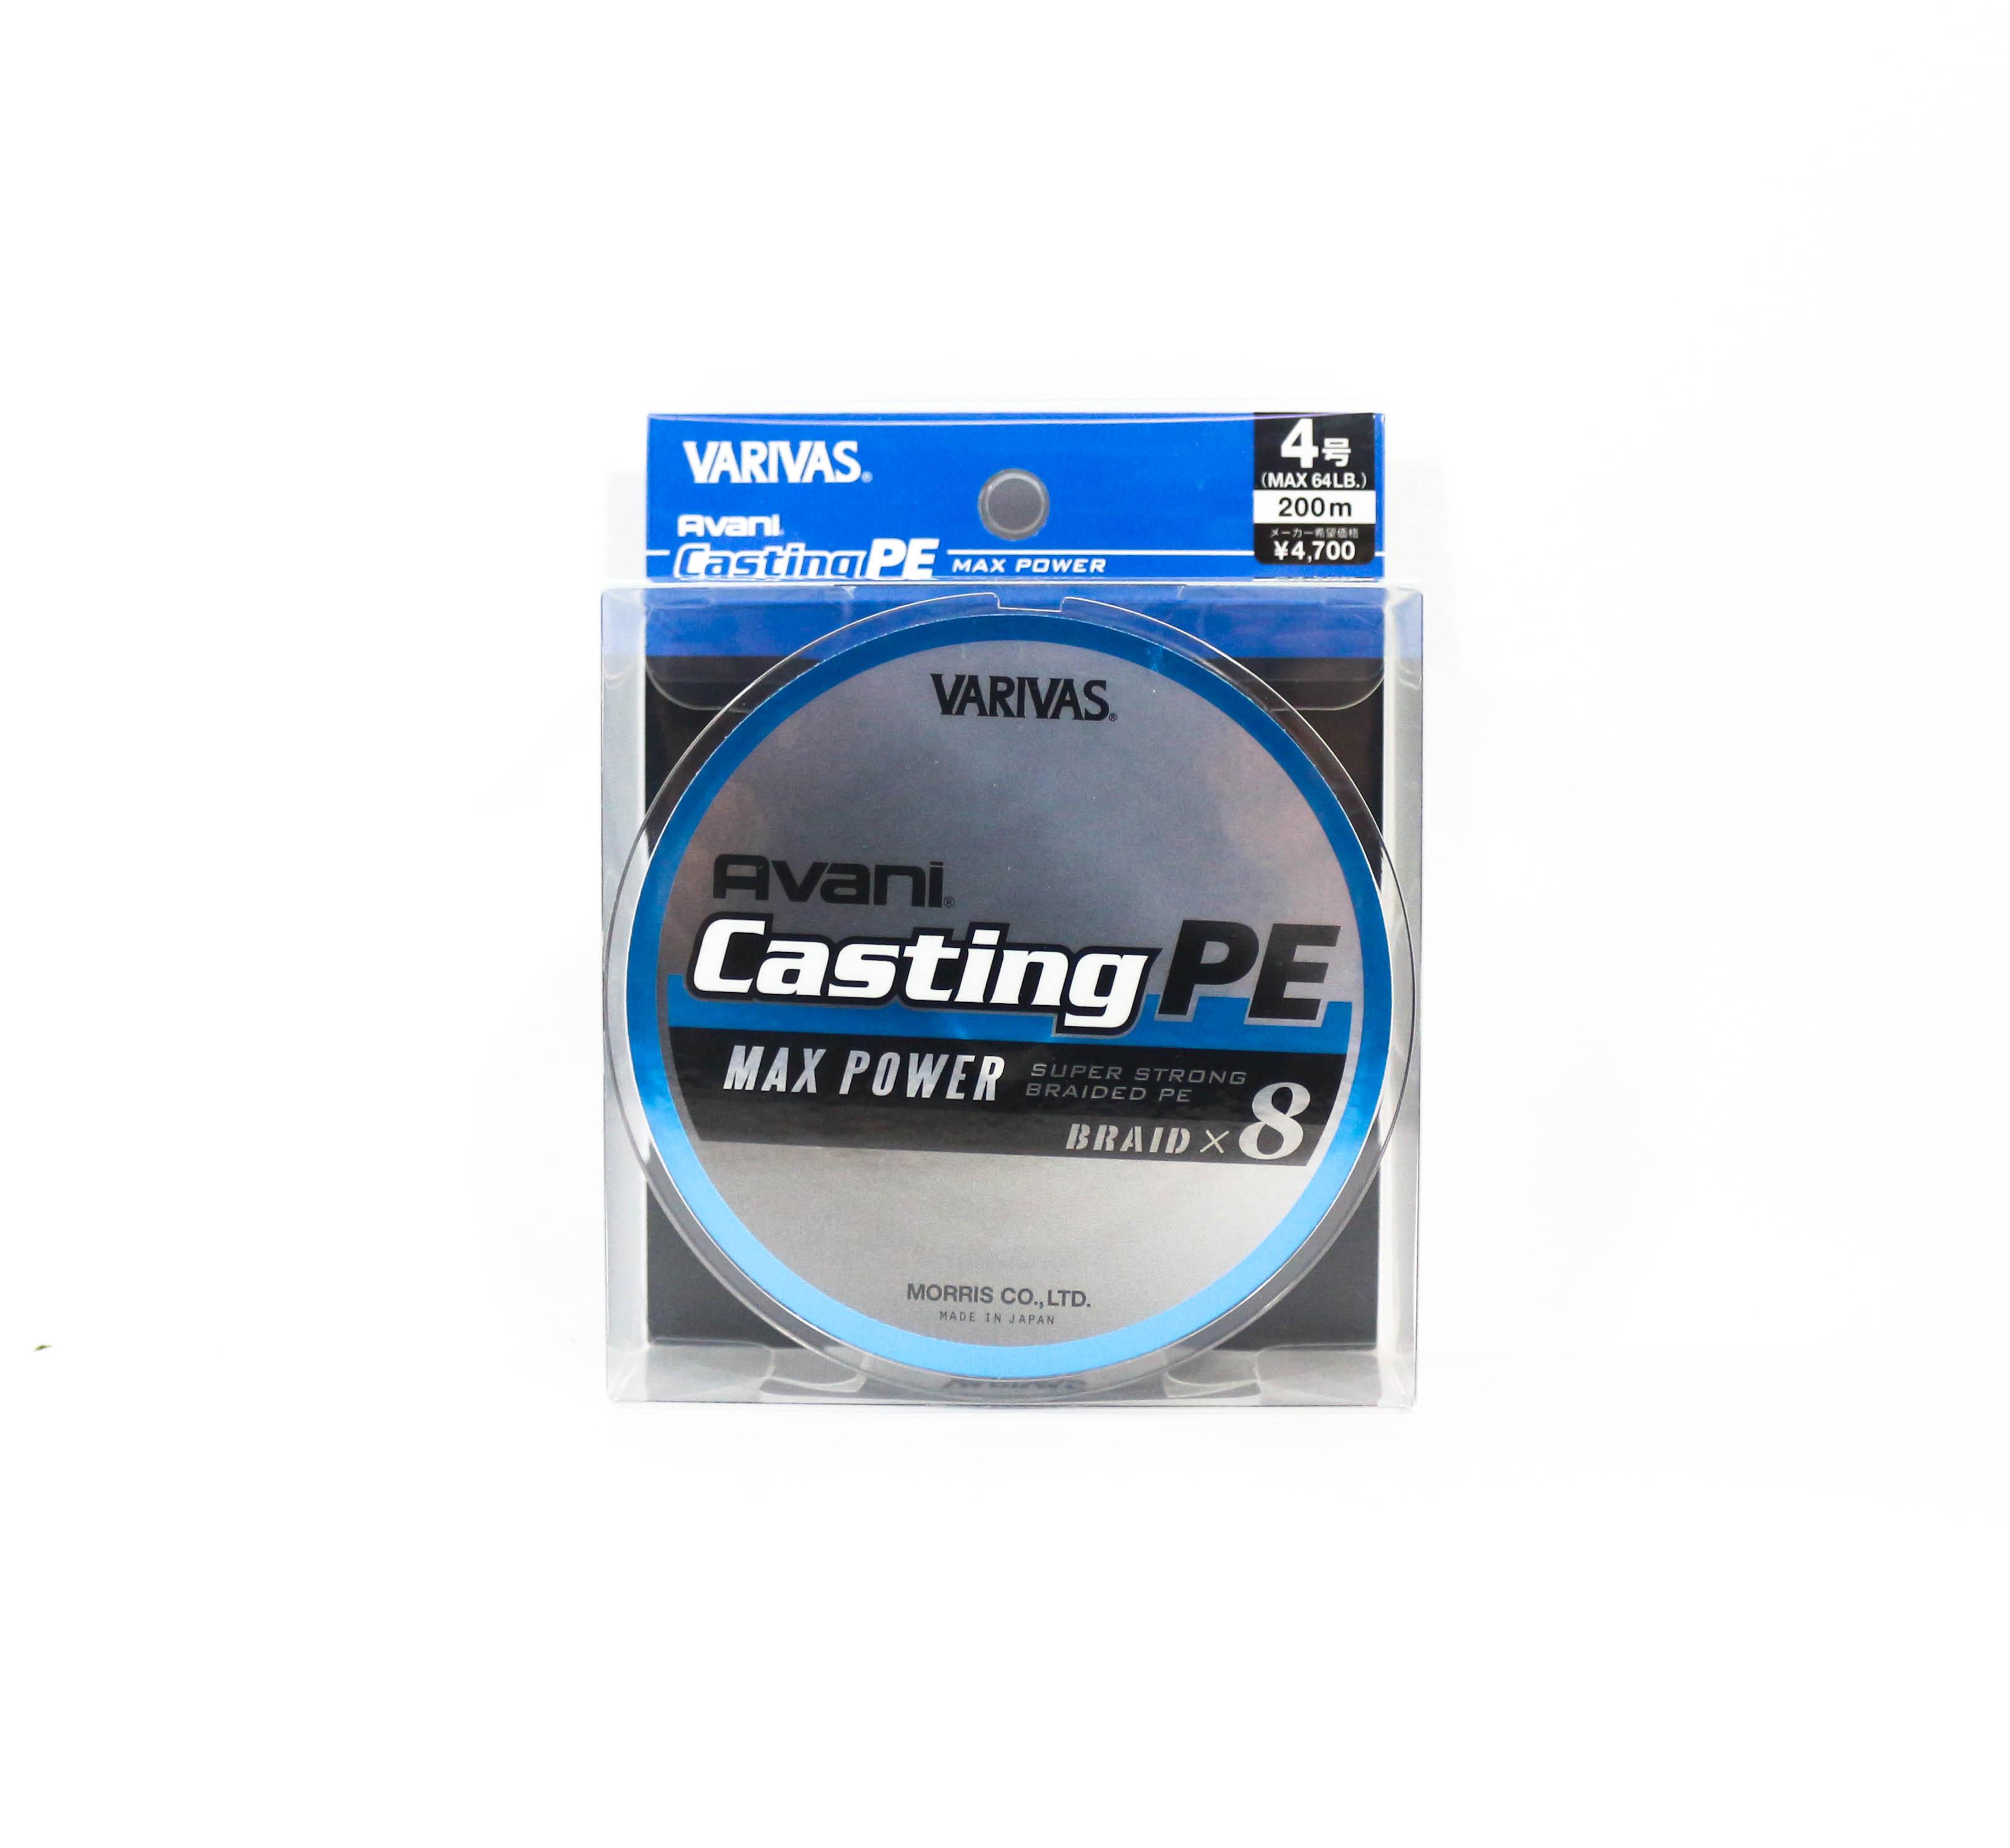 Sale Varivas P.E Line New Avani Max Power Casting 200m P.E 4 64lb (9528)